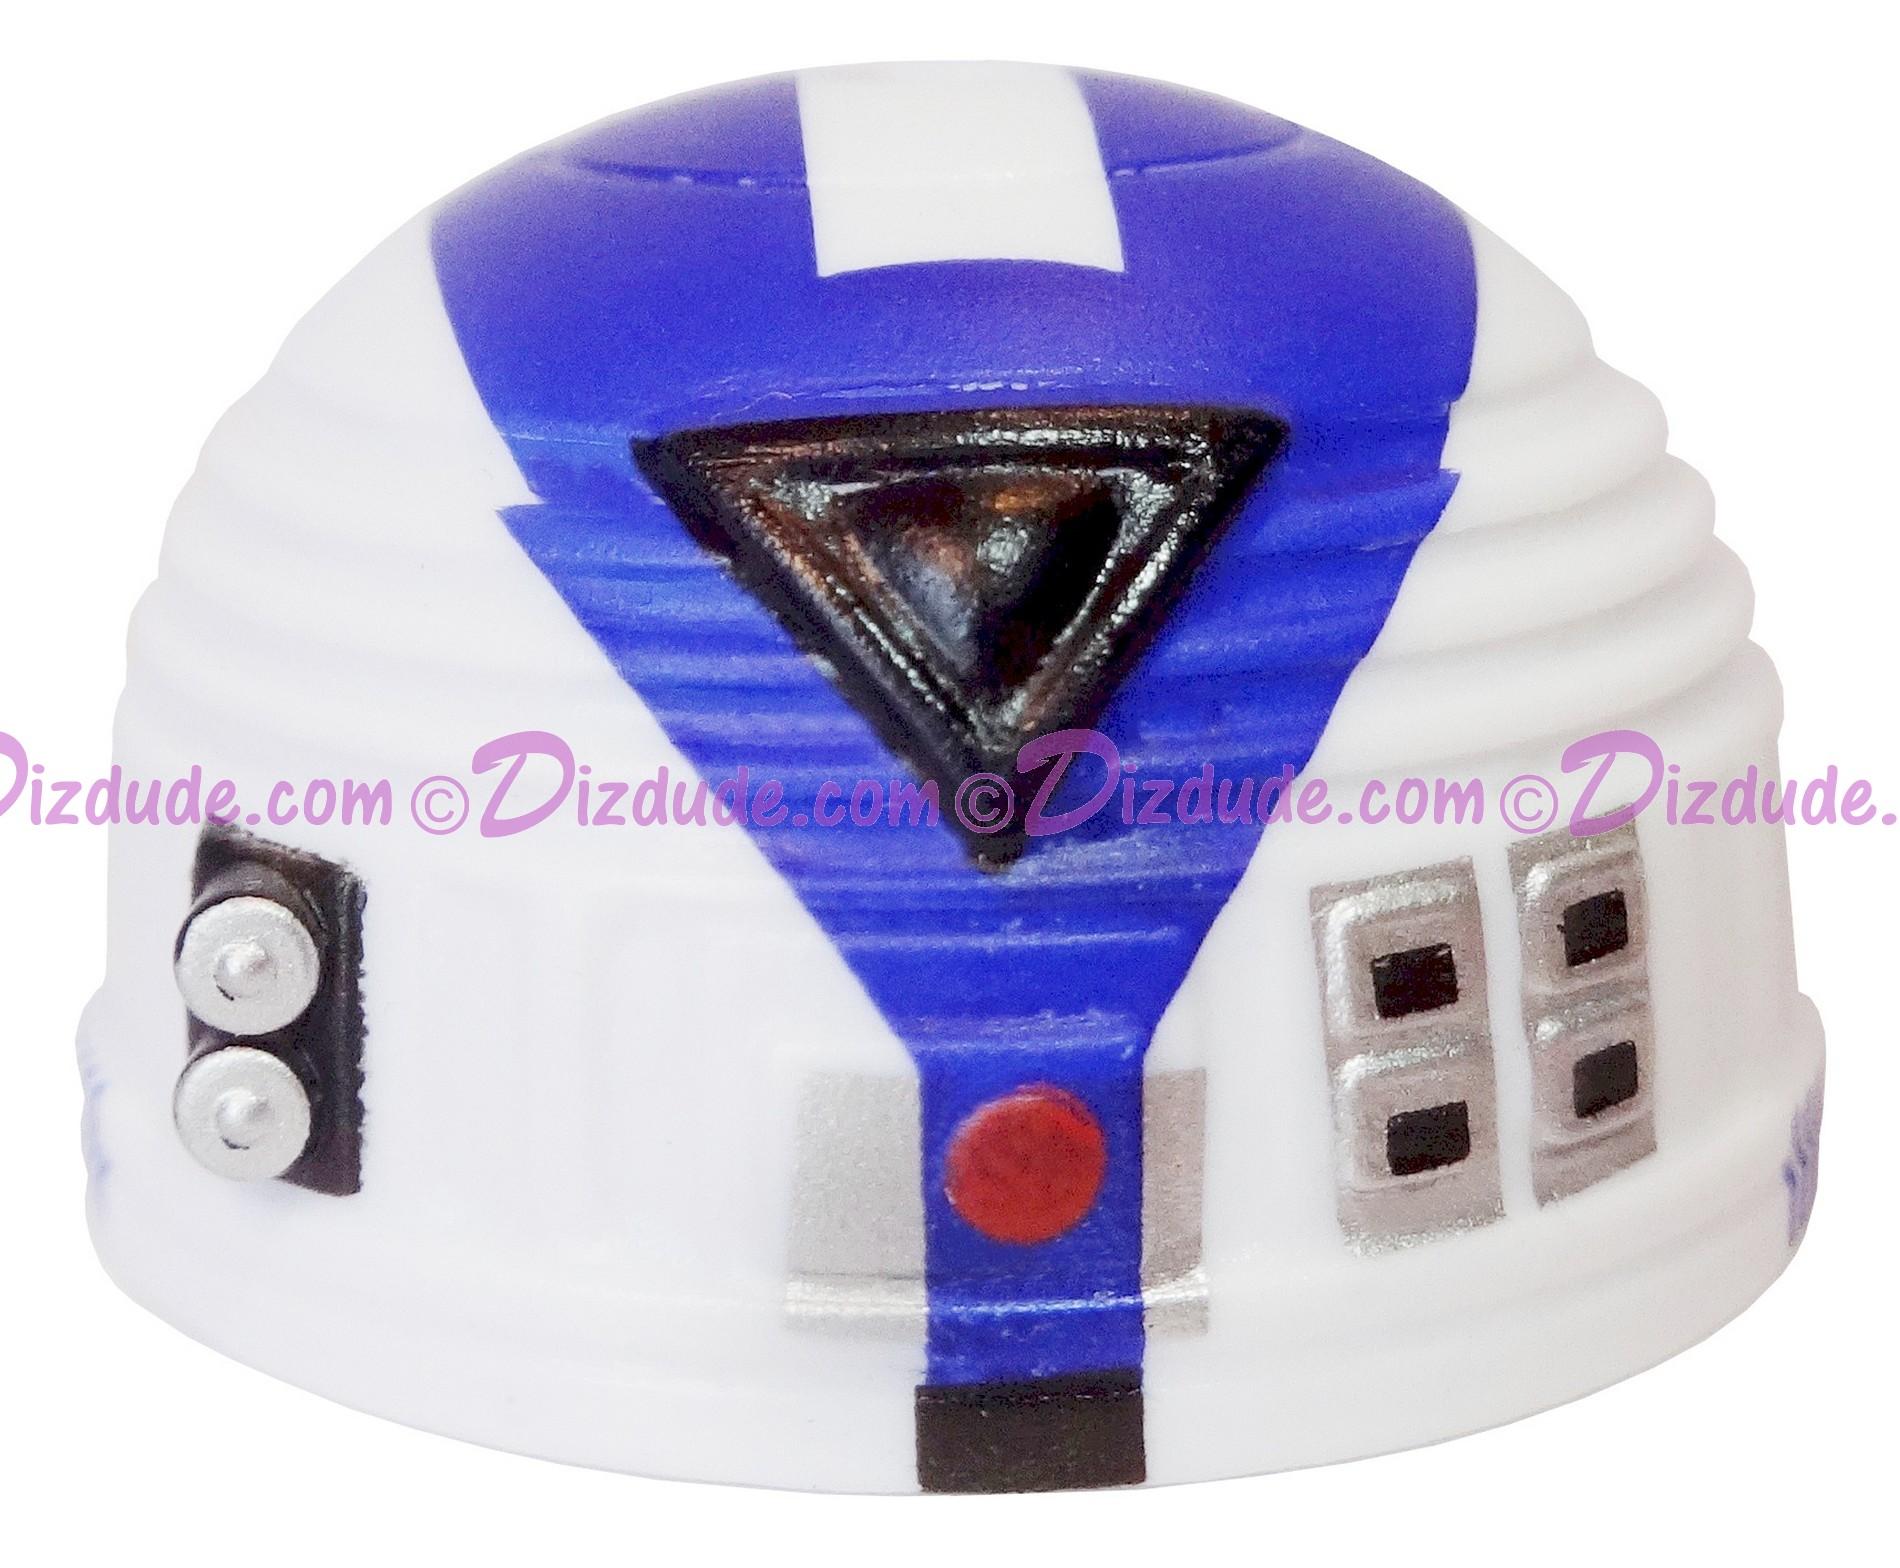 R7 White & Blue Astromech Droid Dome ~ Series 2 from Disney Star Wars Build-A-Droid Factory © Dizdude.com